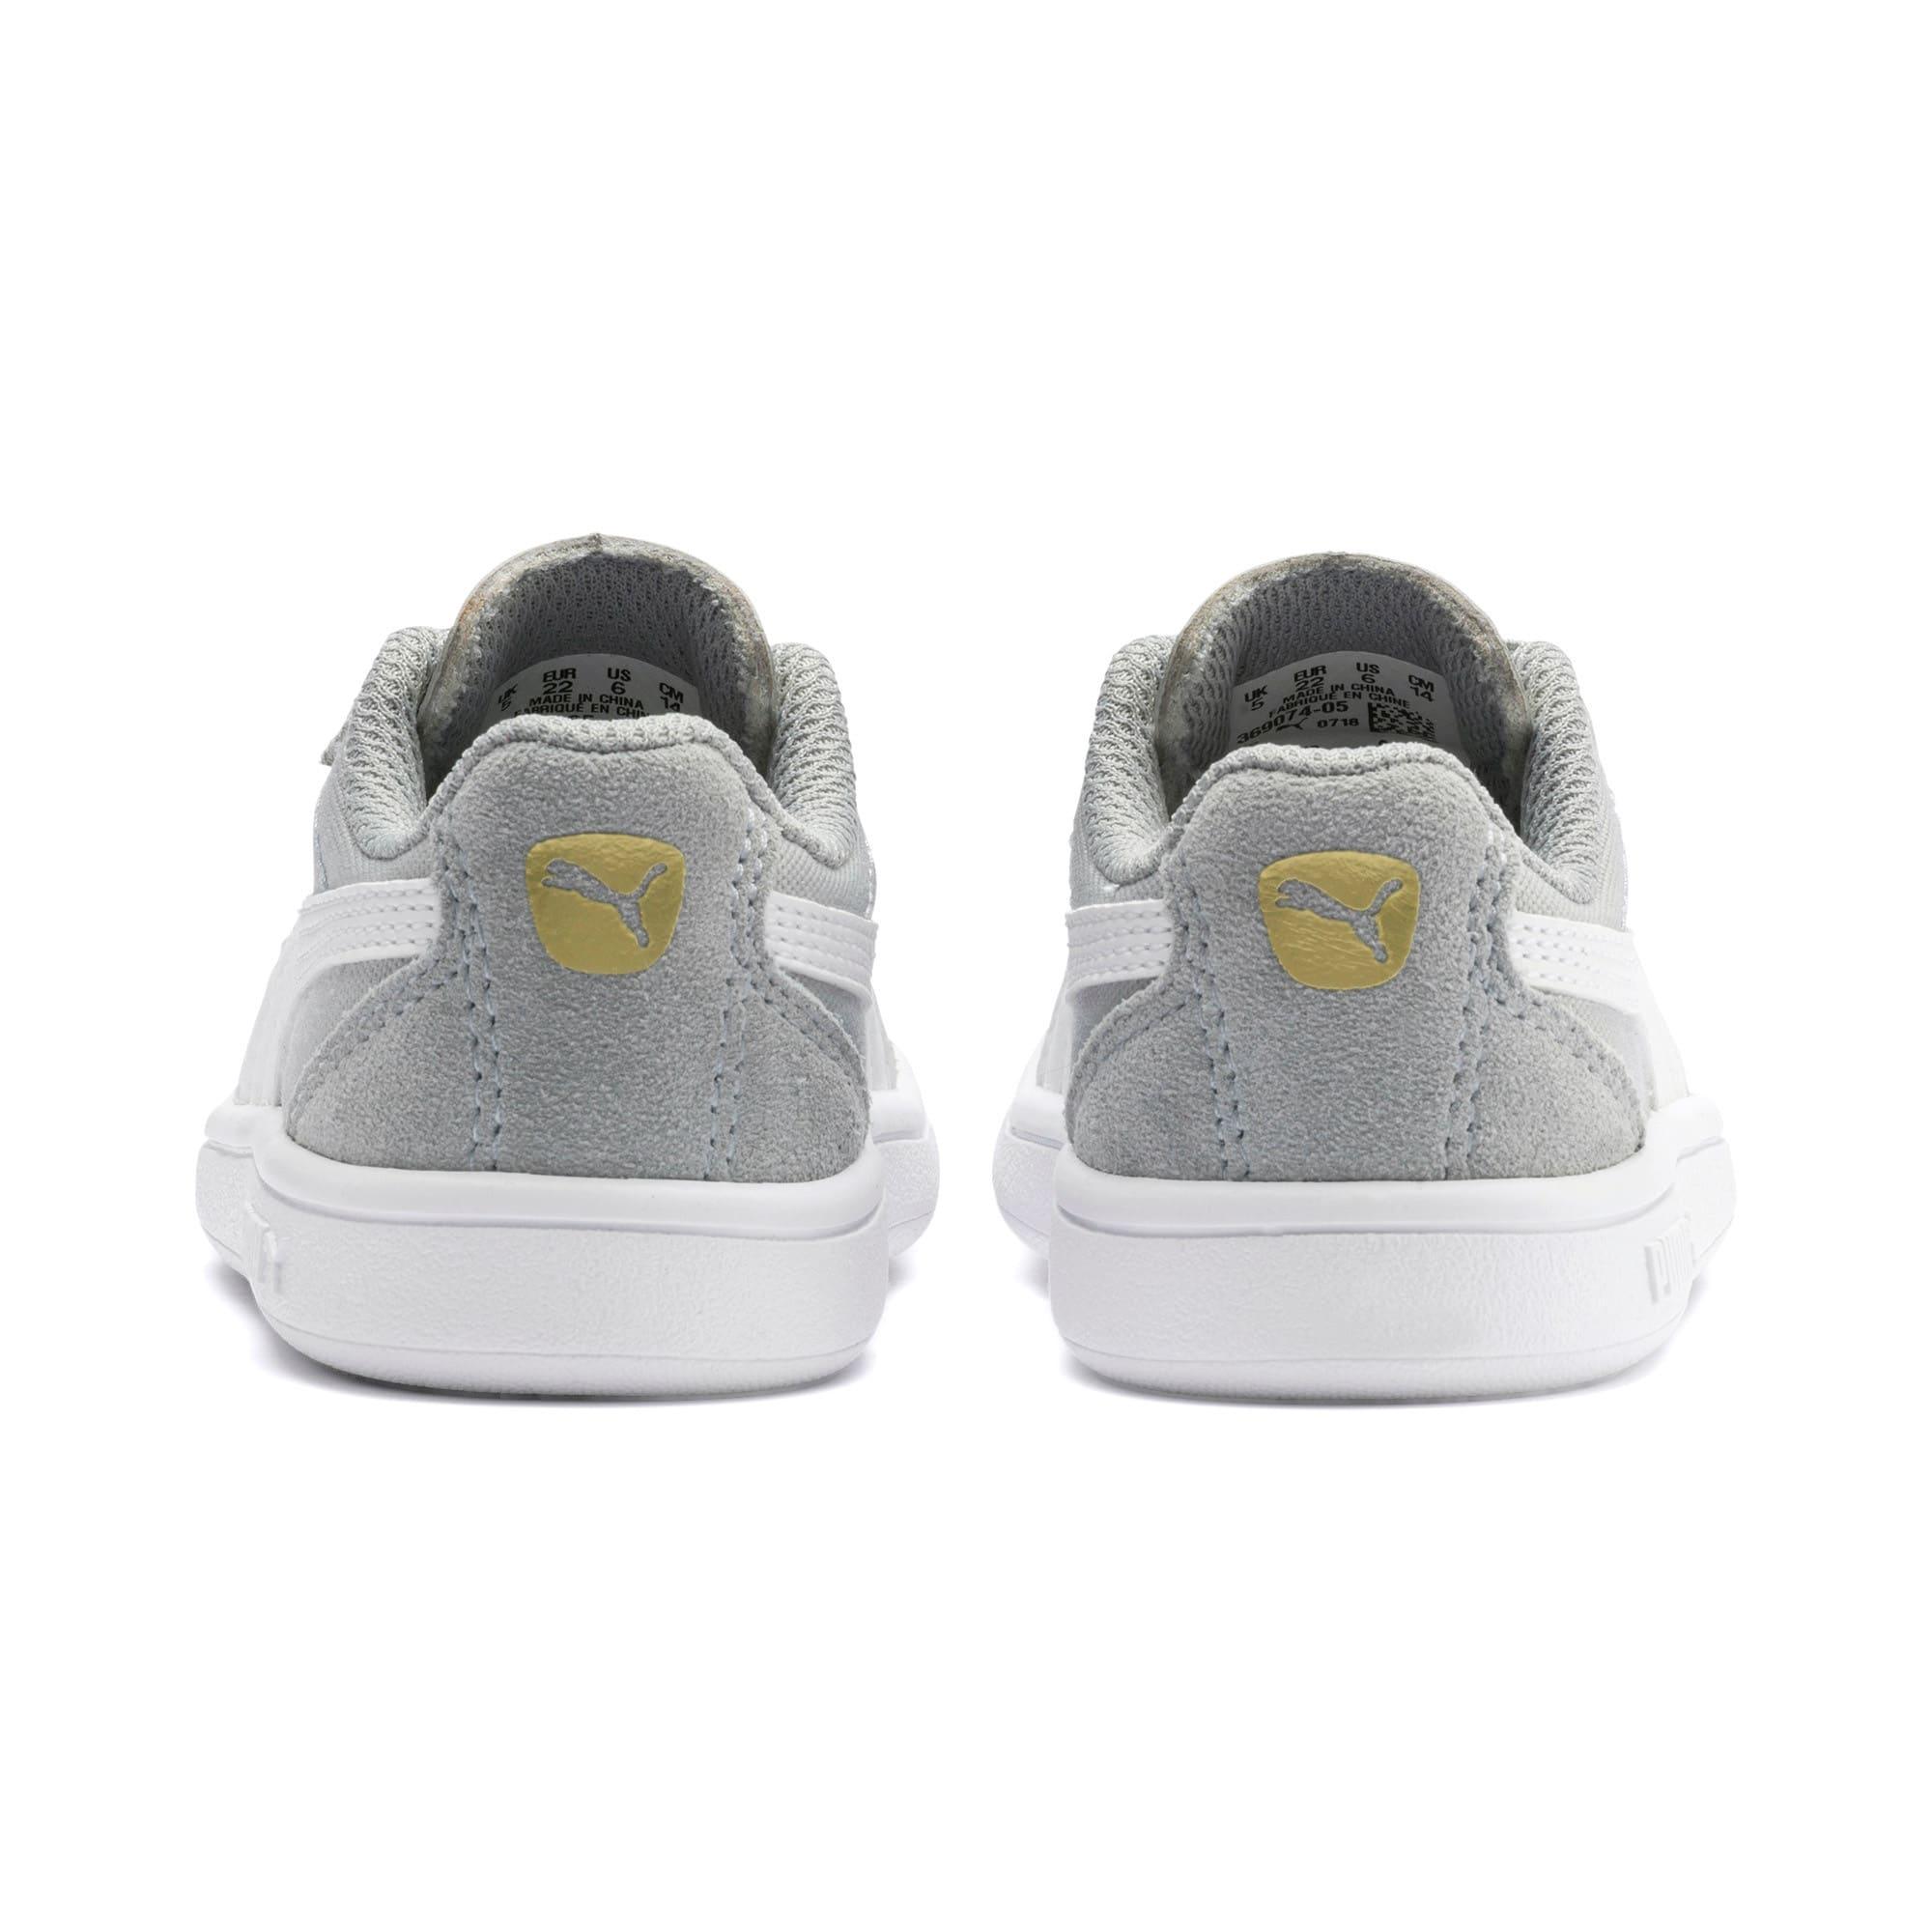 Thumbnail 3 of Astro Kick AC Toddler Shoes, H Rise-Wht-Gold-G Violet-Gum, medium